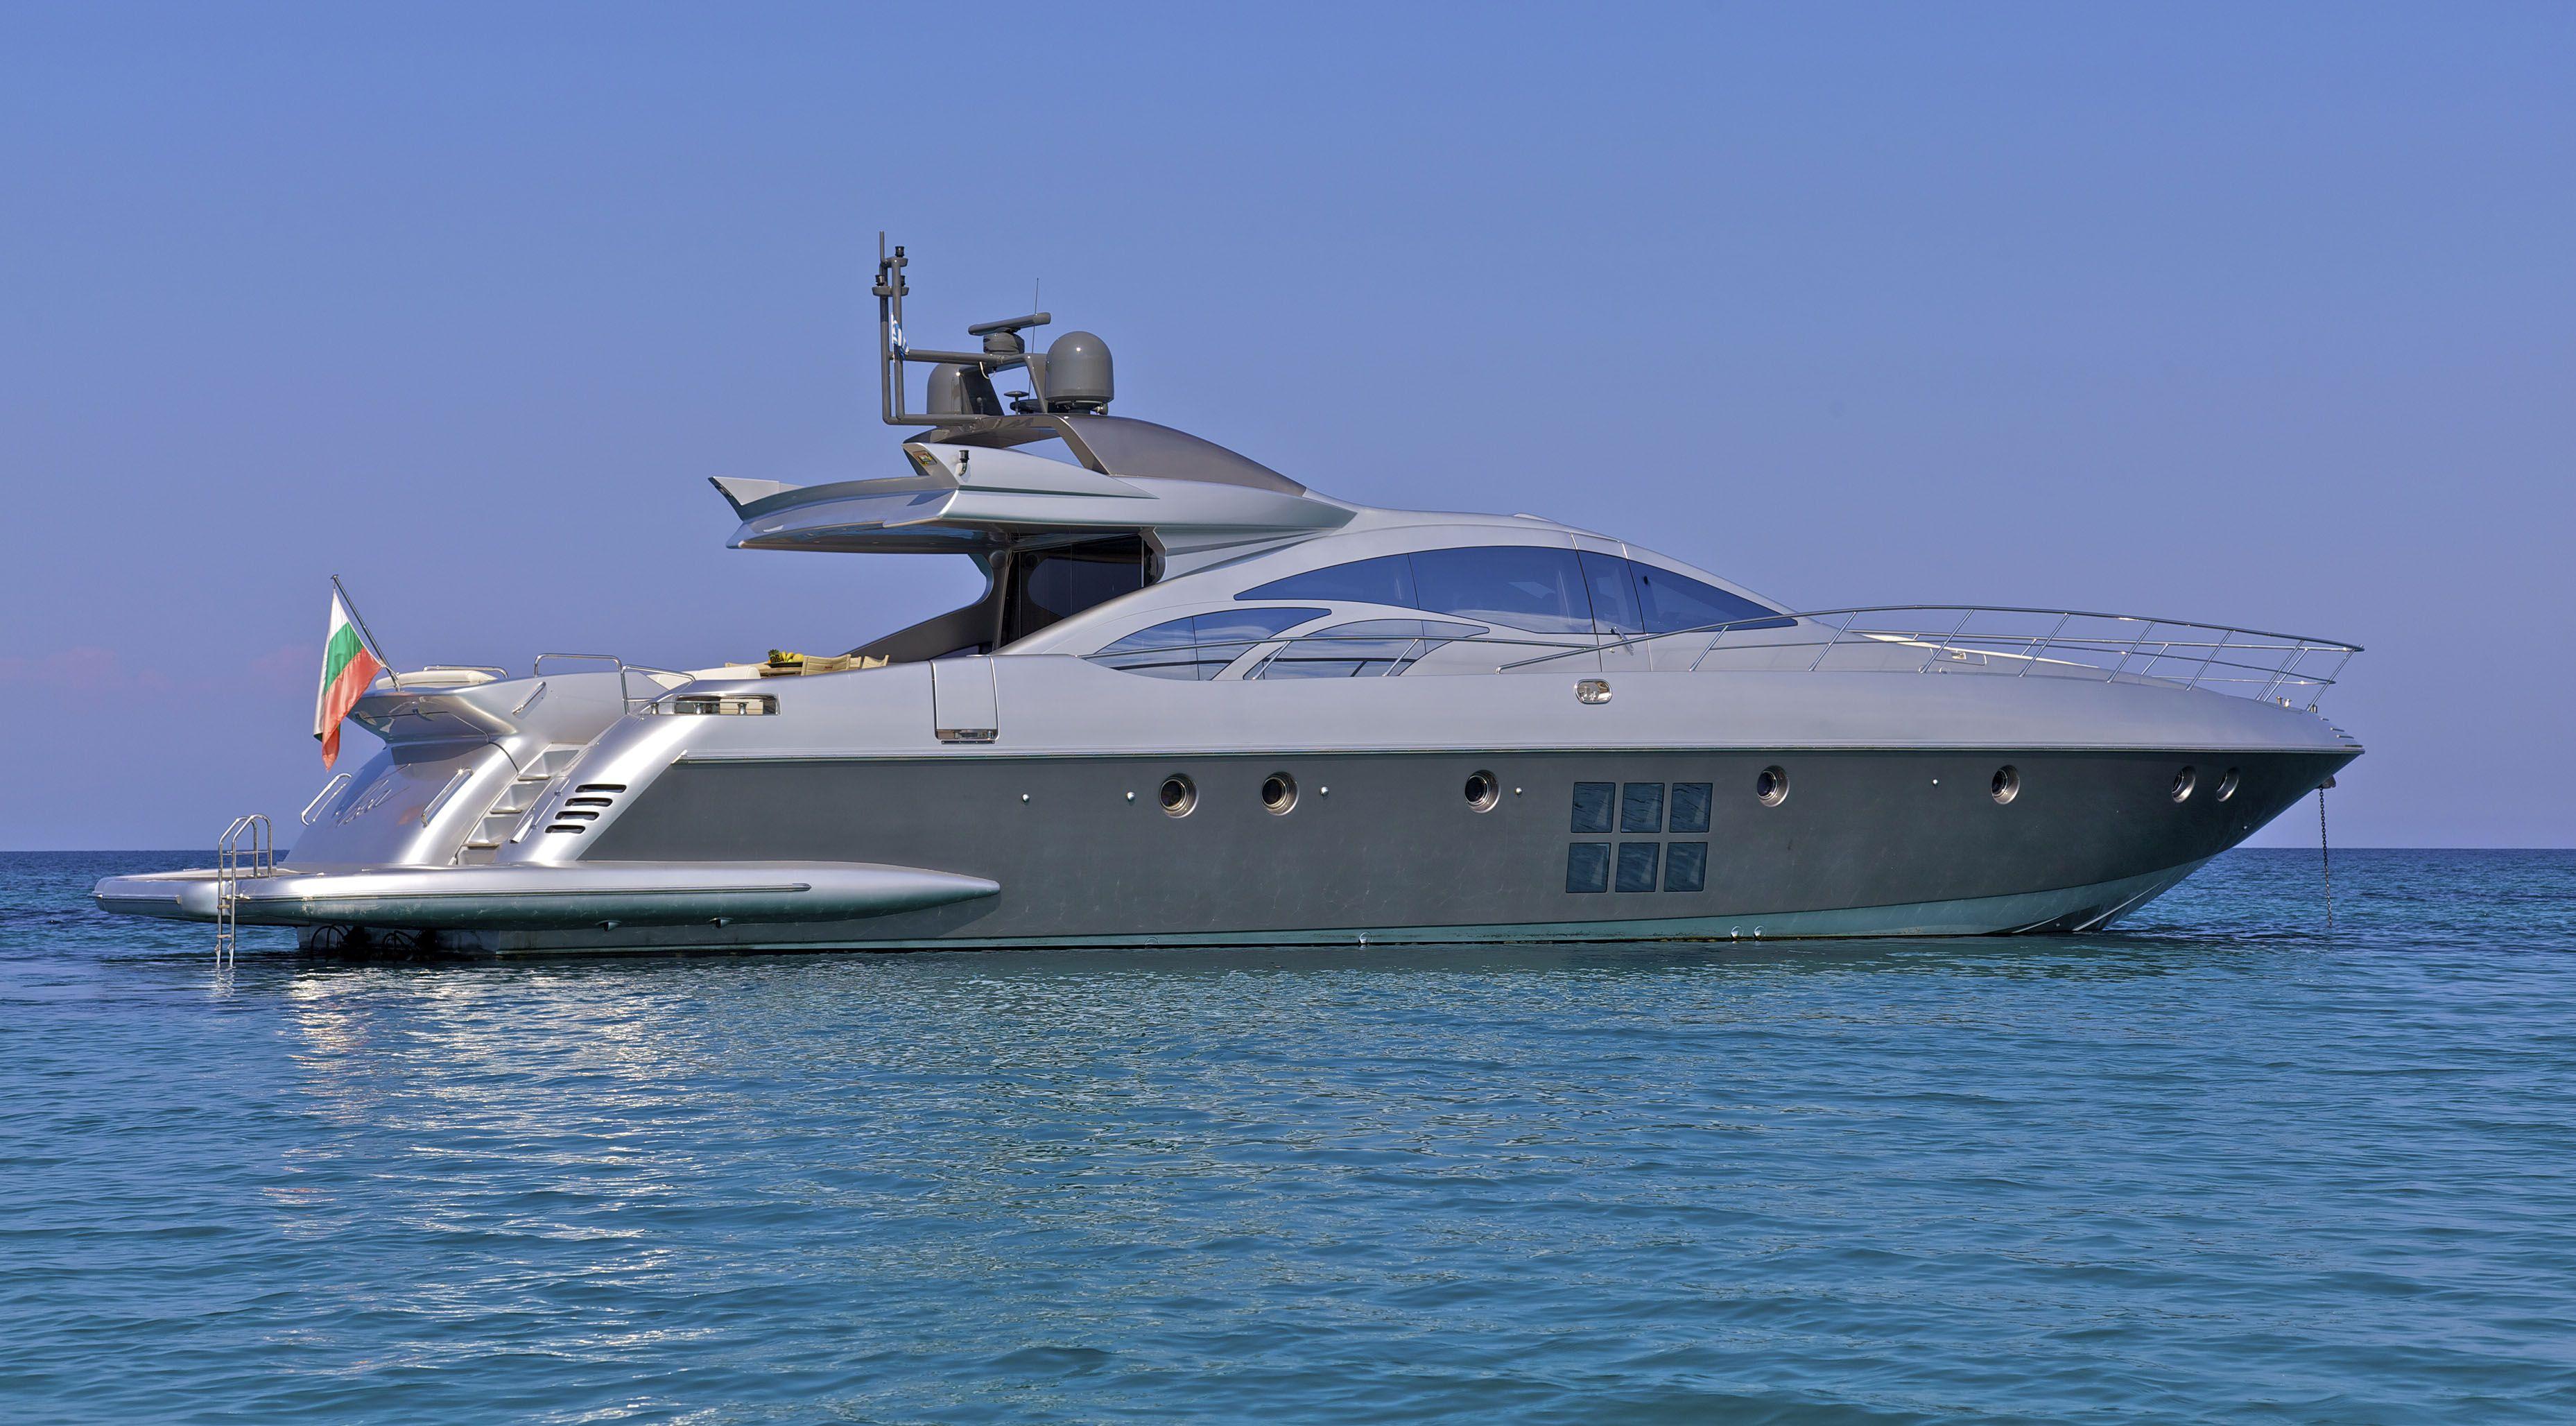 Azimut 86 motor yacht cruisers pinterest motor yacht for Luxury motor yachts for sale